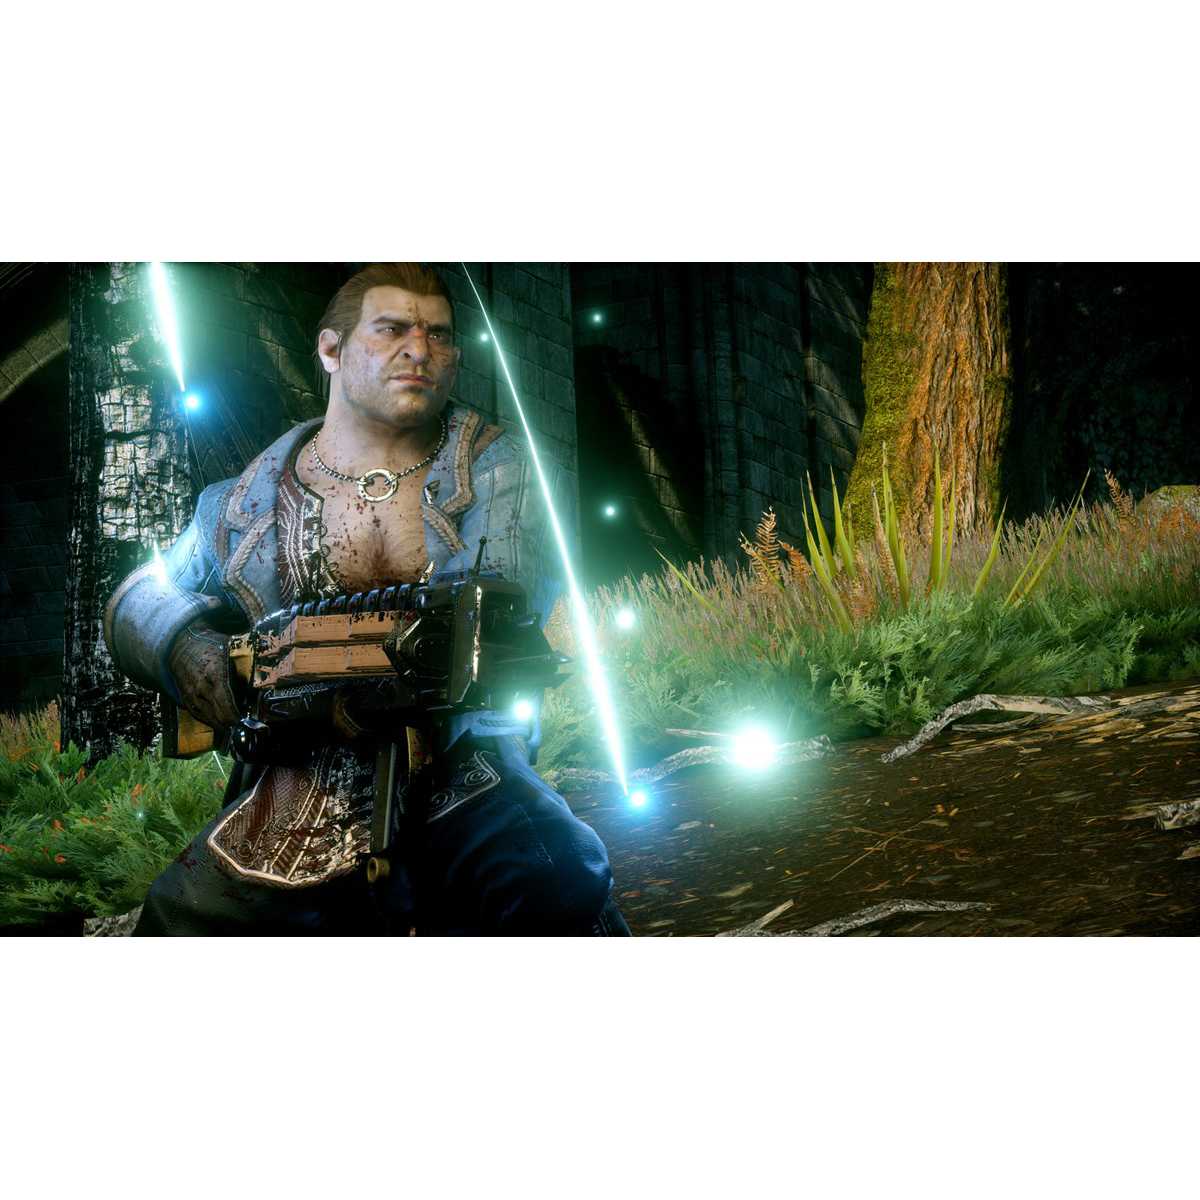 Joc Dragon Age: Inquisition pentru PlayStation 3 16